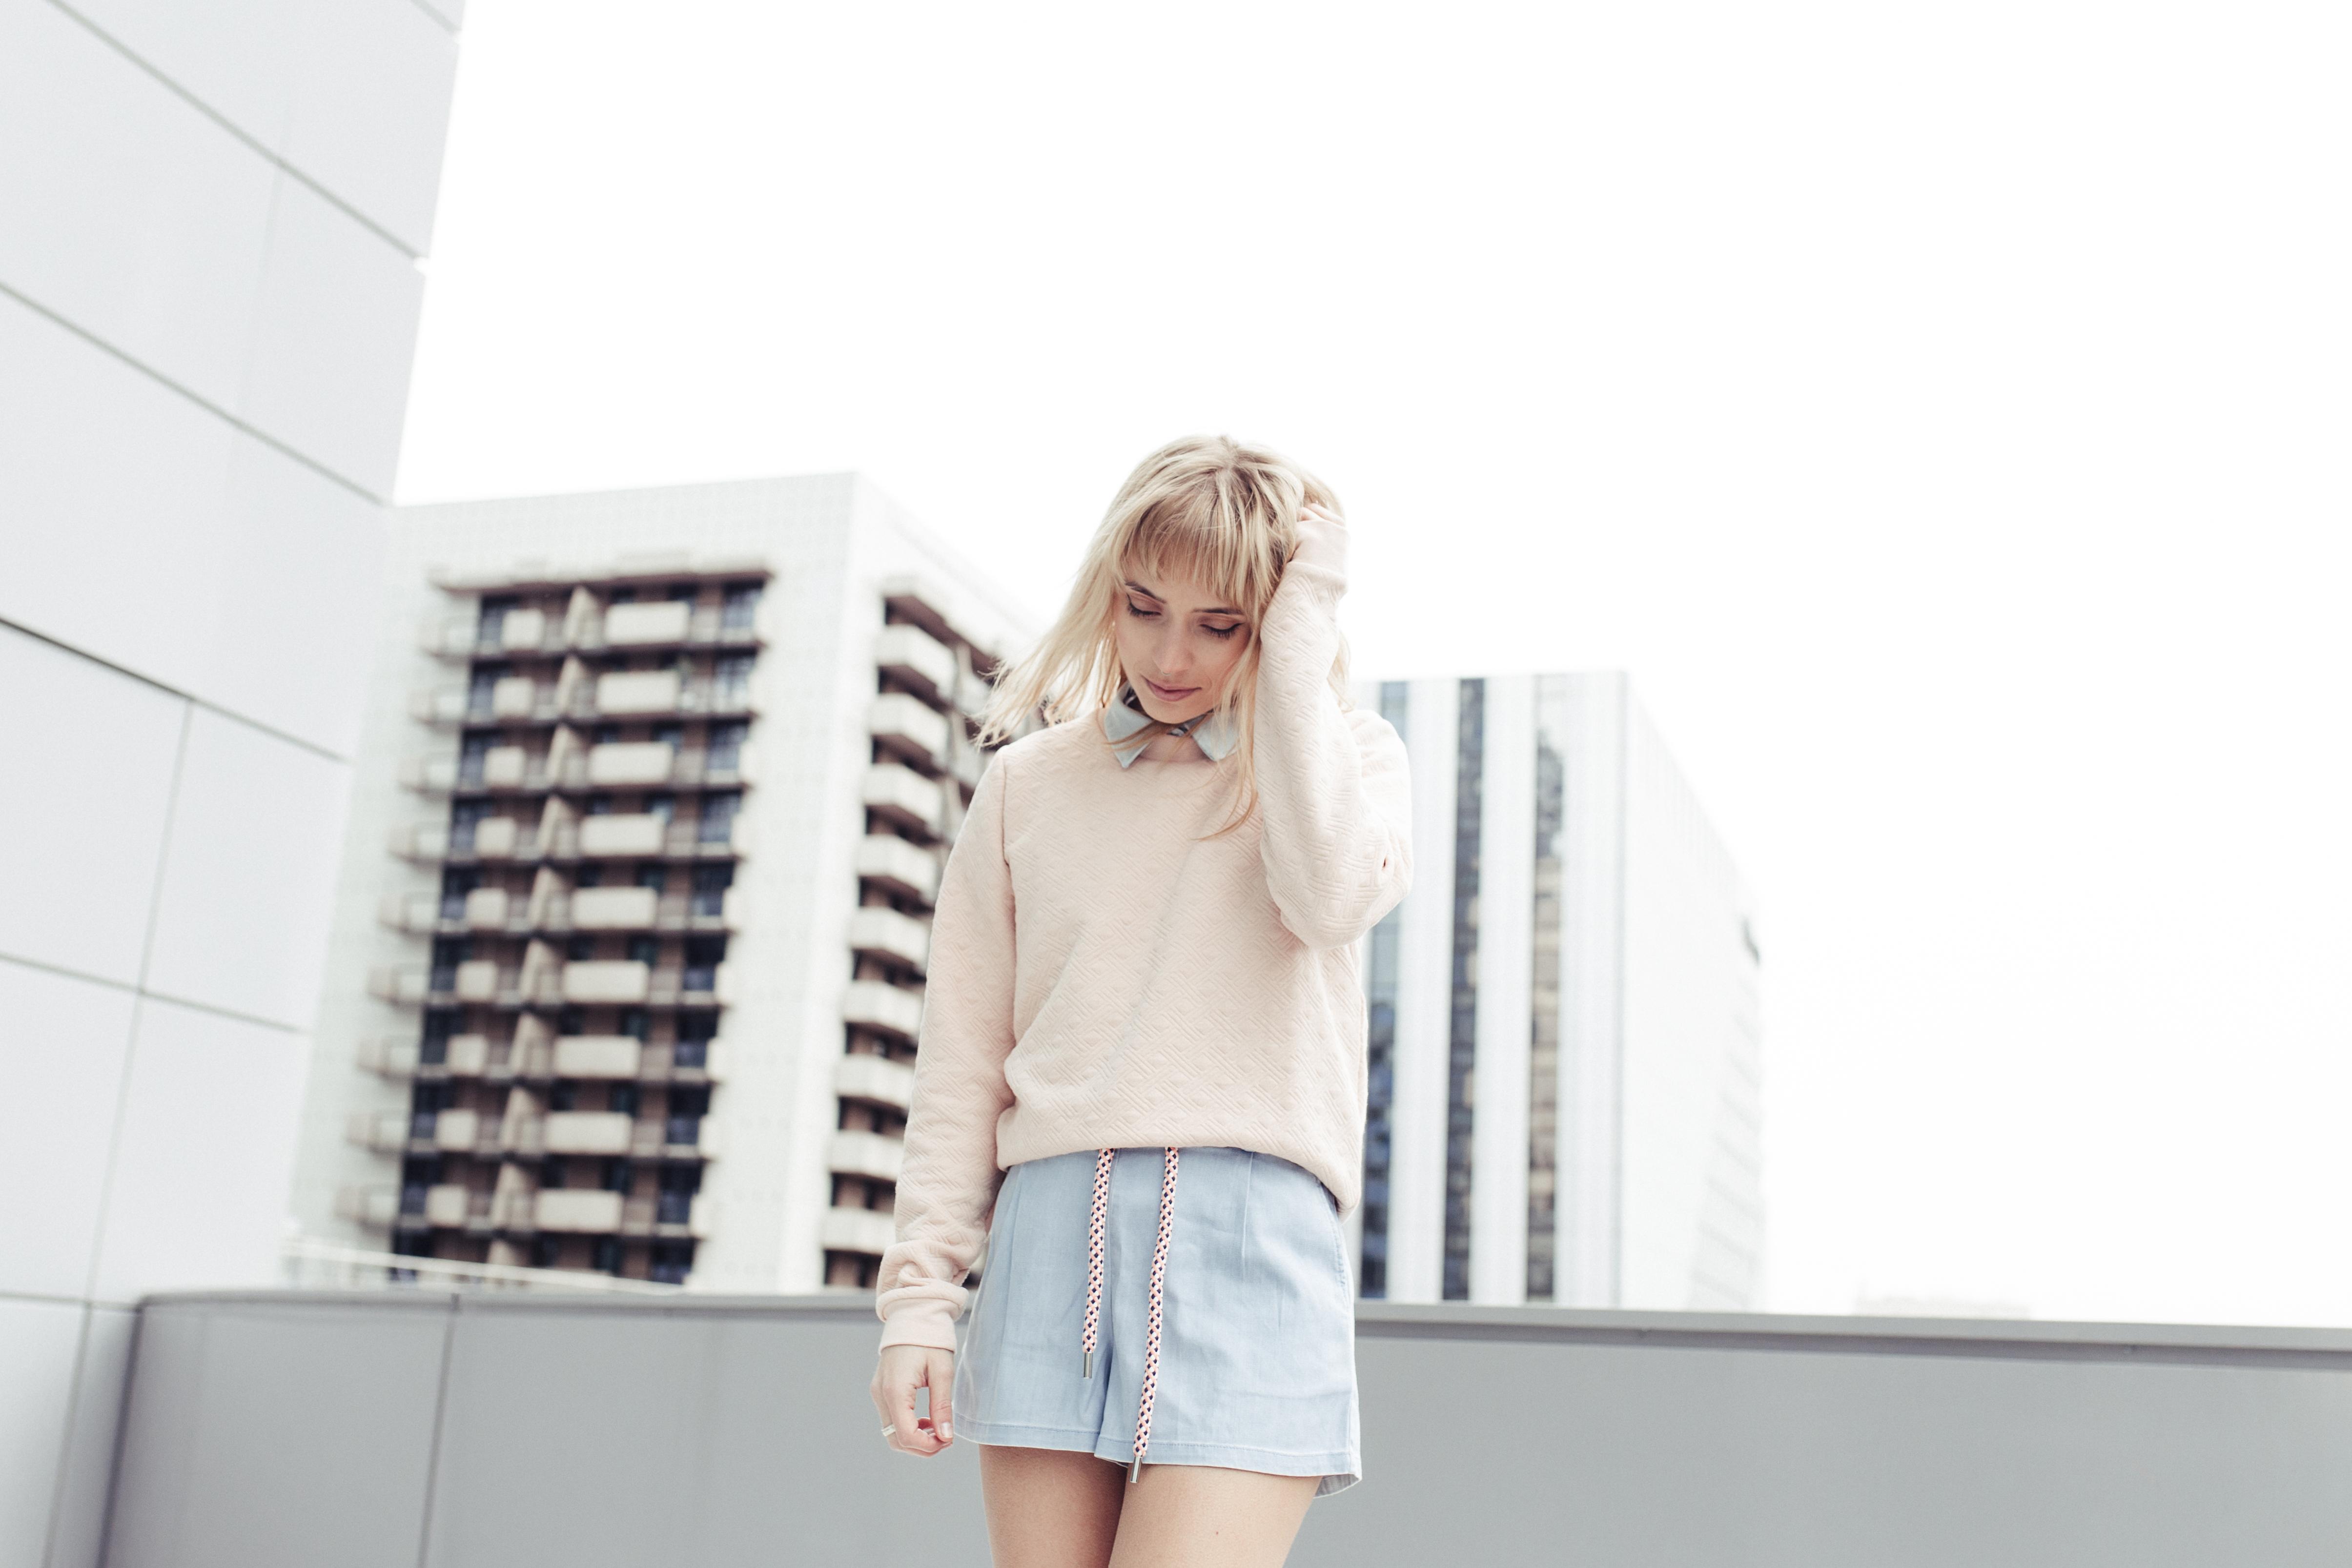 princessetamtam-astrid-lyloutte-3